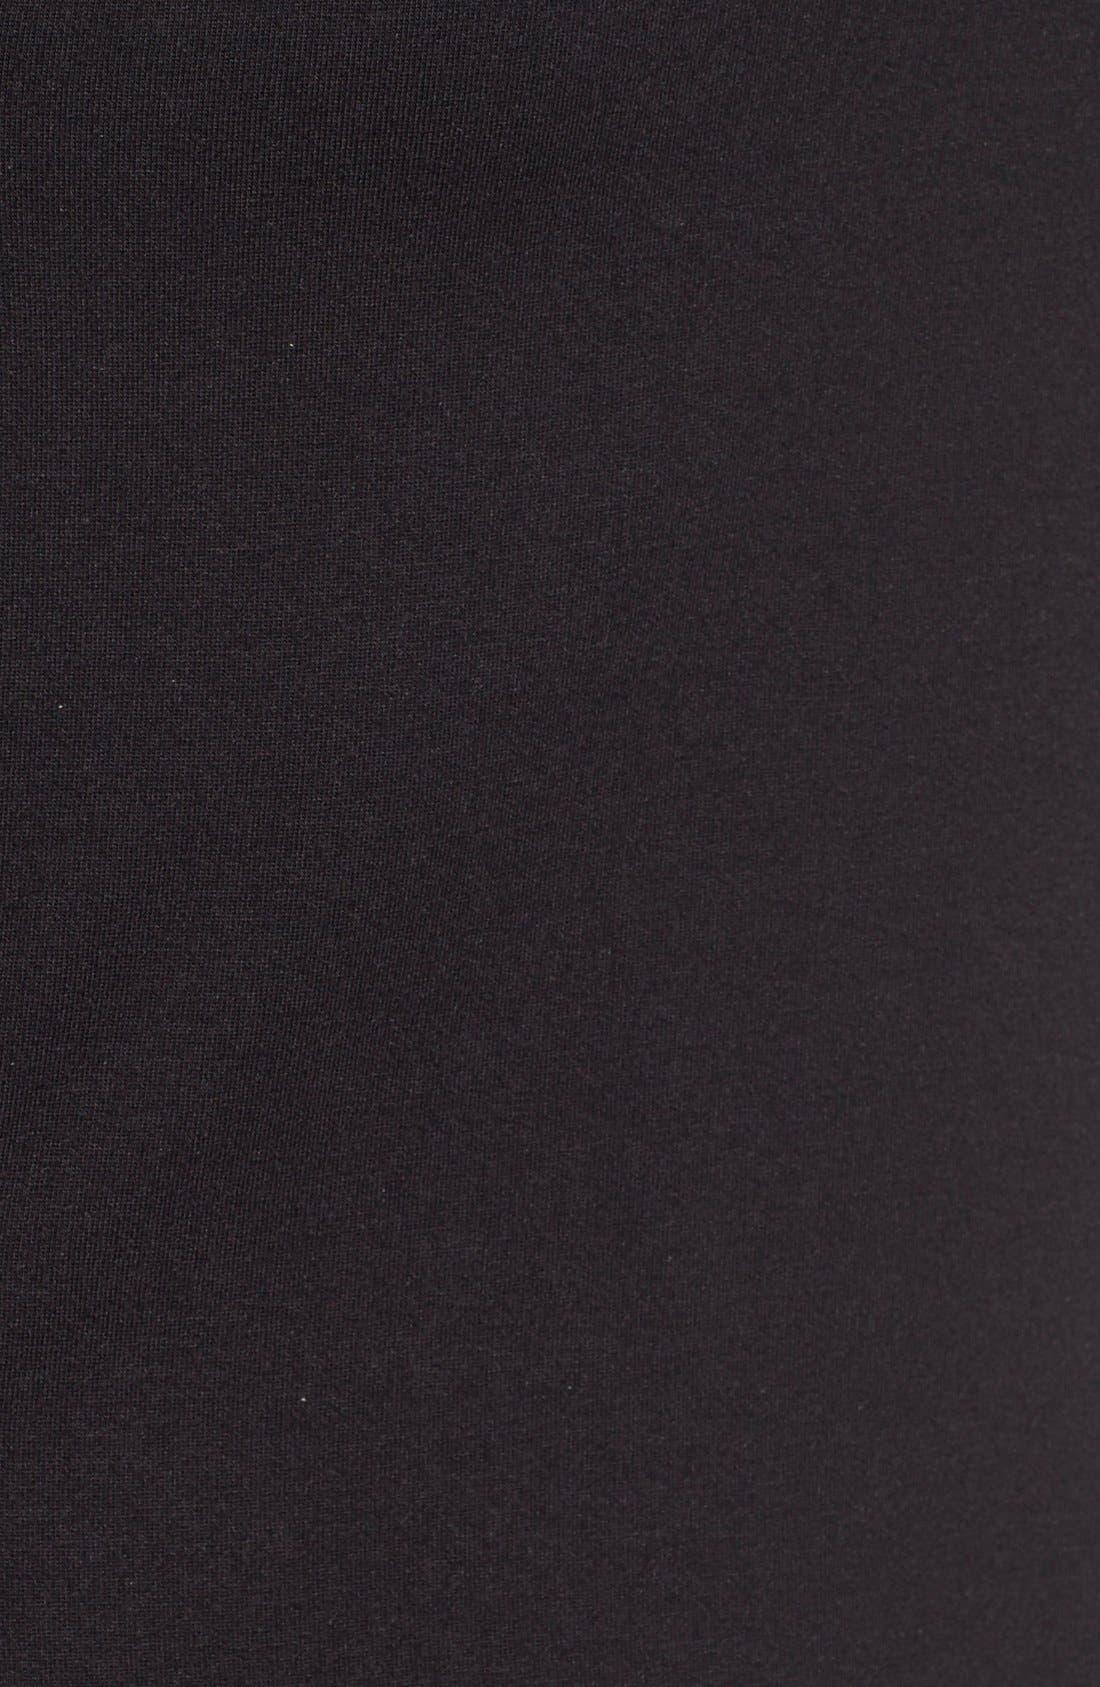 'Elena' Roll Tab Sleeve Top,                             Alternate thumbnail 5, color,                             BLACK